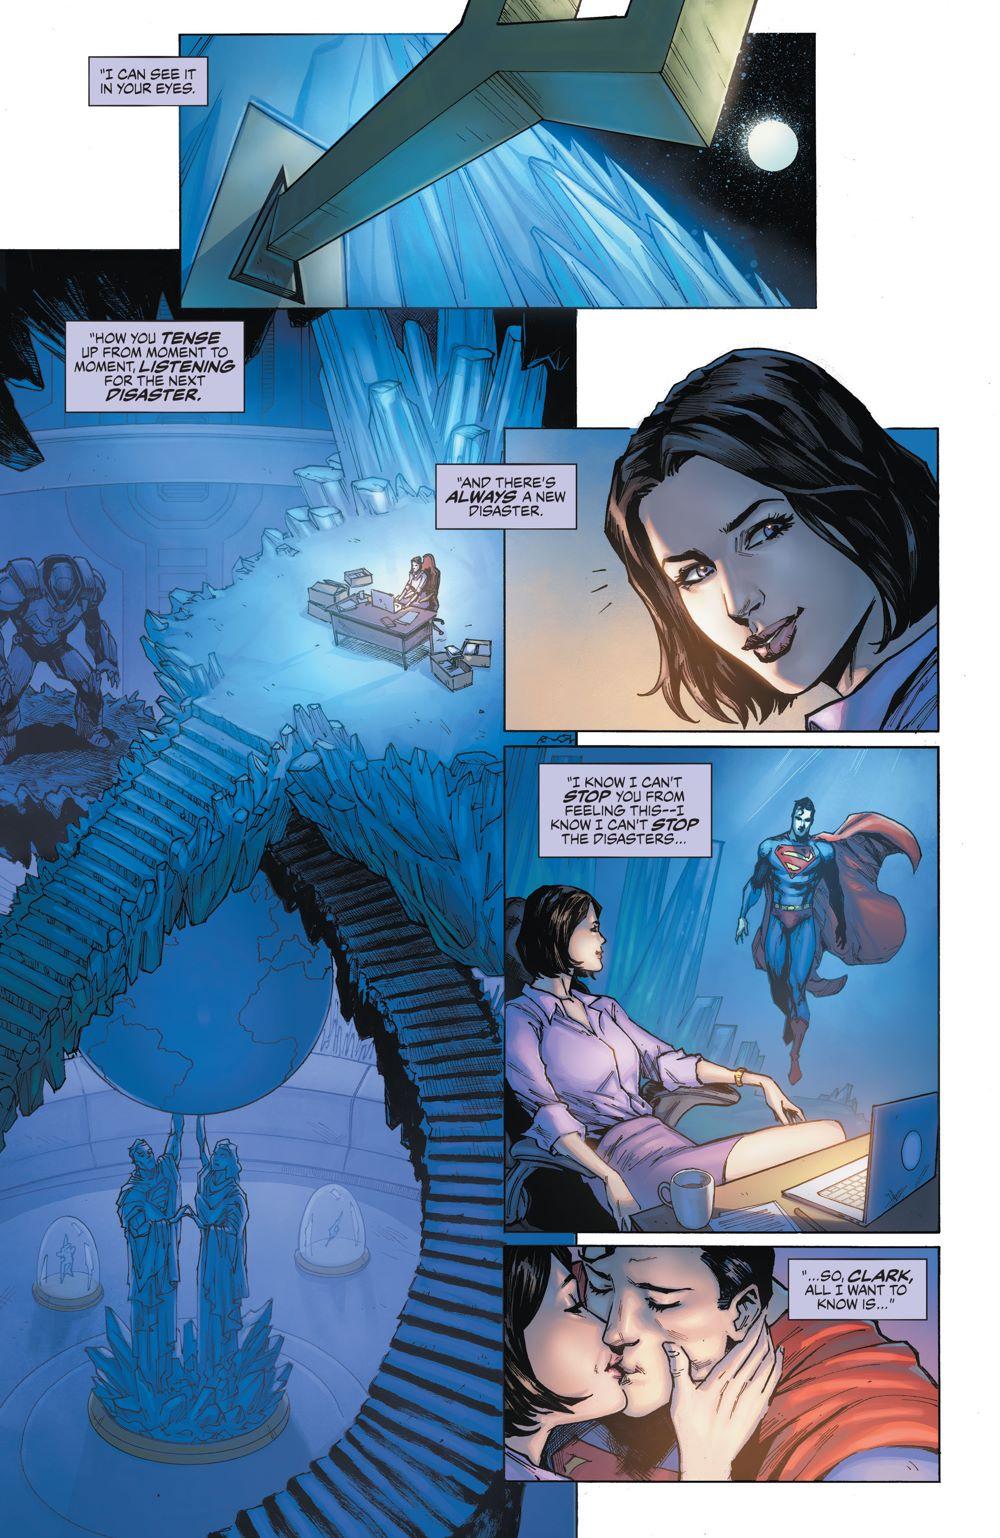 Justice-League-Last-Ride-1-4_60935c3521a731.60948901 ComicList Previews: JUSTICE LEAGUE LAST RIDE #1